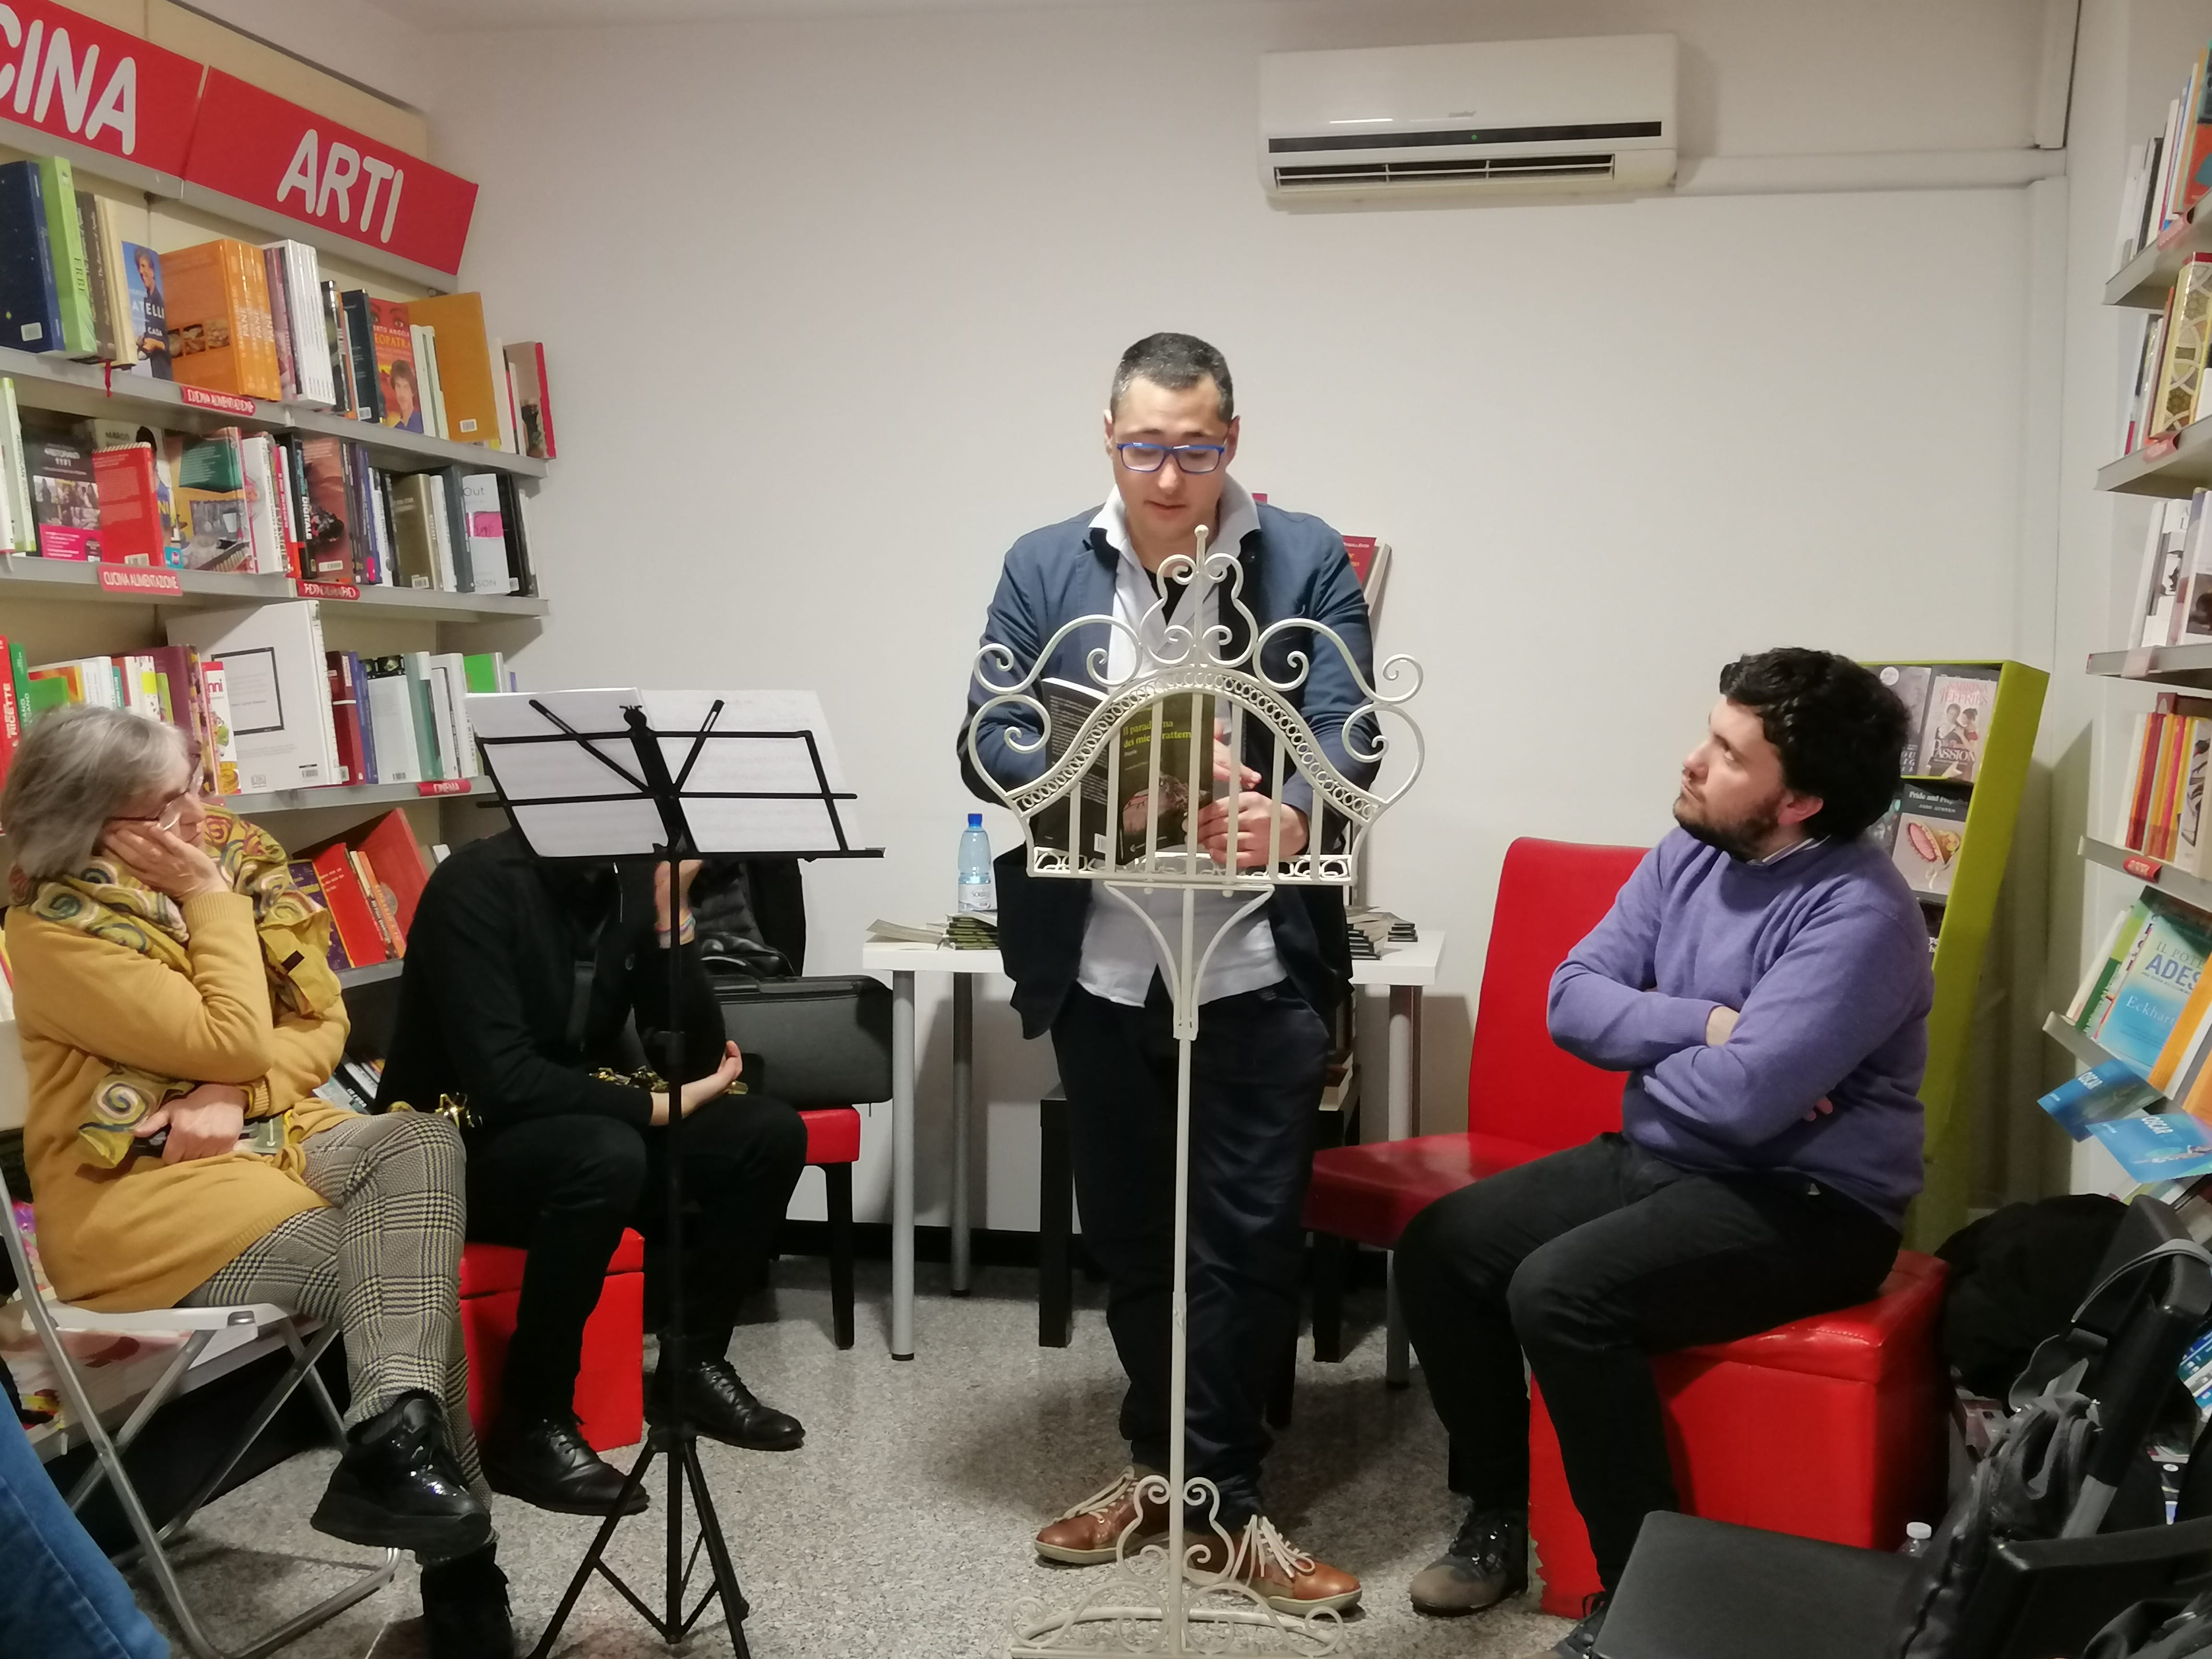 floriano lamanna presenta la prima raccolta poetica-LameziaTermeit